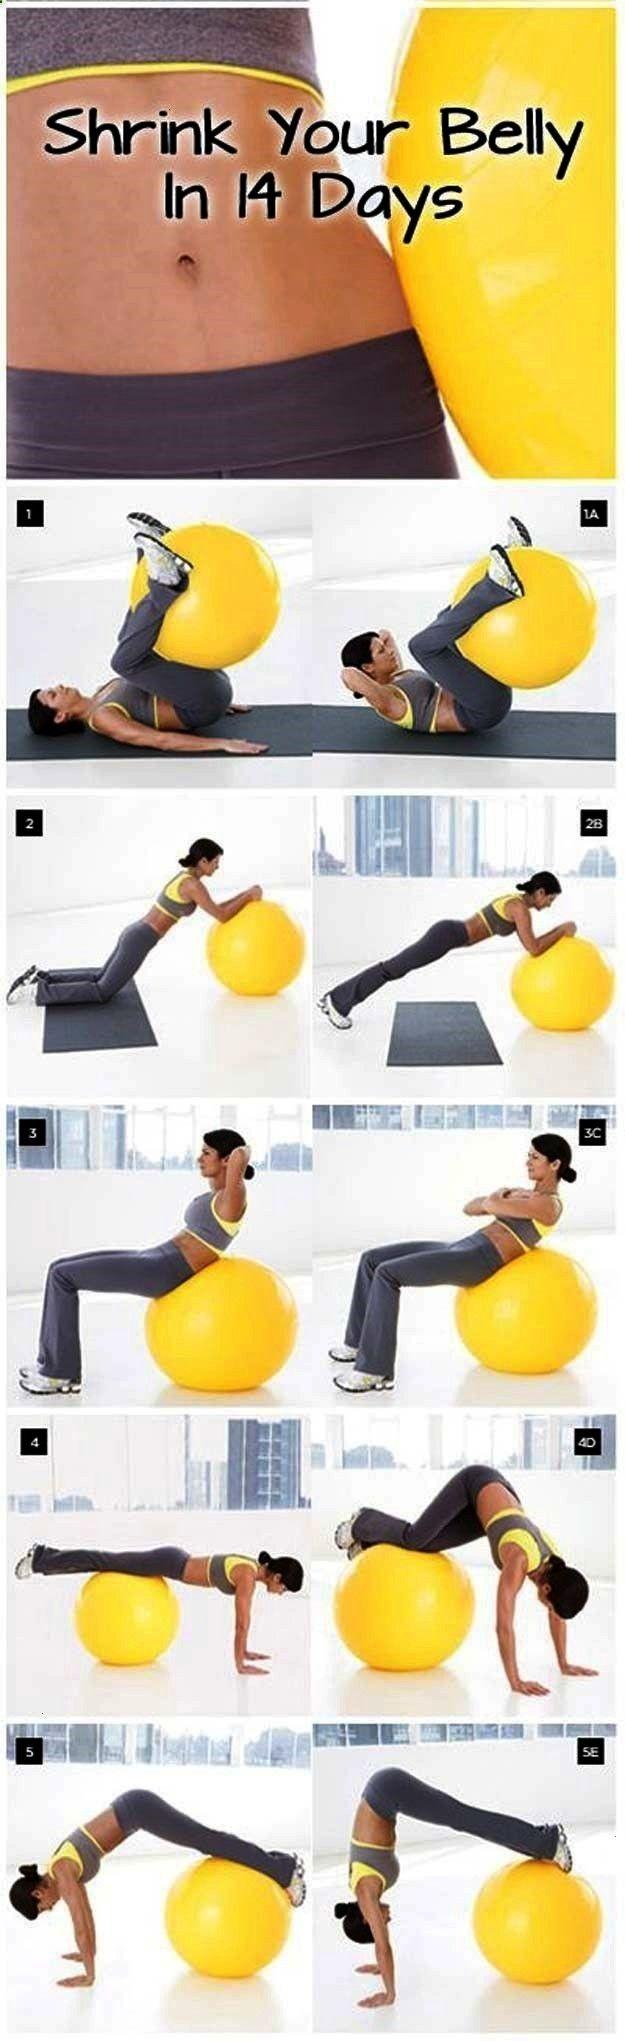 #bestdietplanforabs #eburnfatcom #weightless #increased #exercises #womenbest #lossbest #workouts #m...